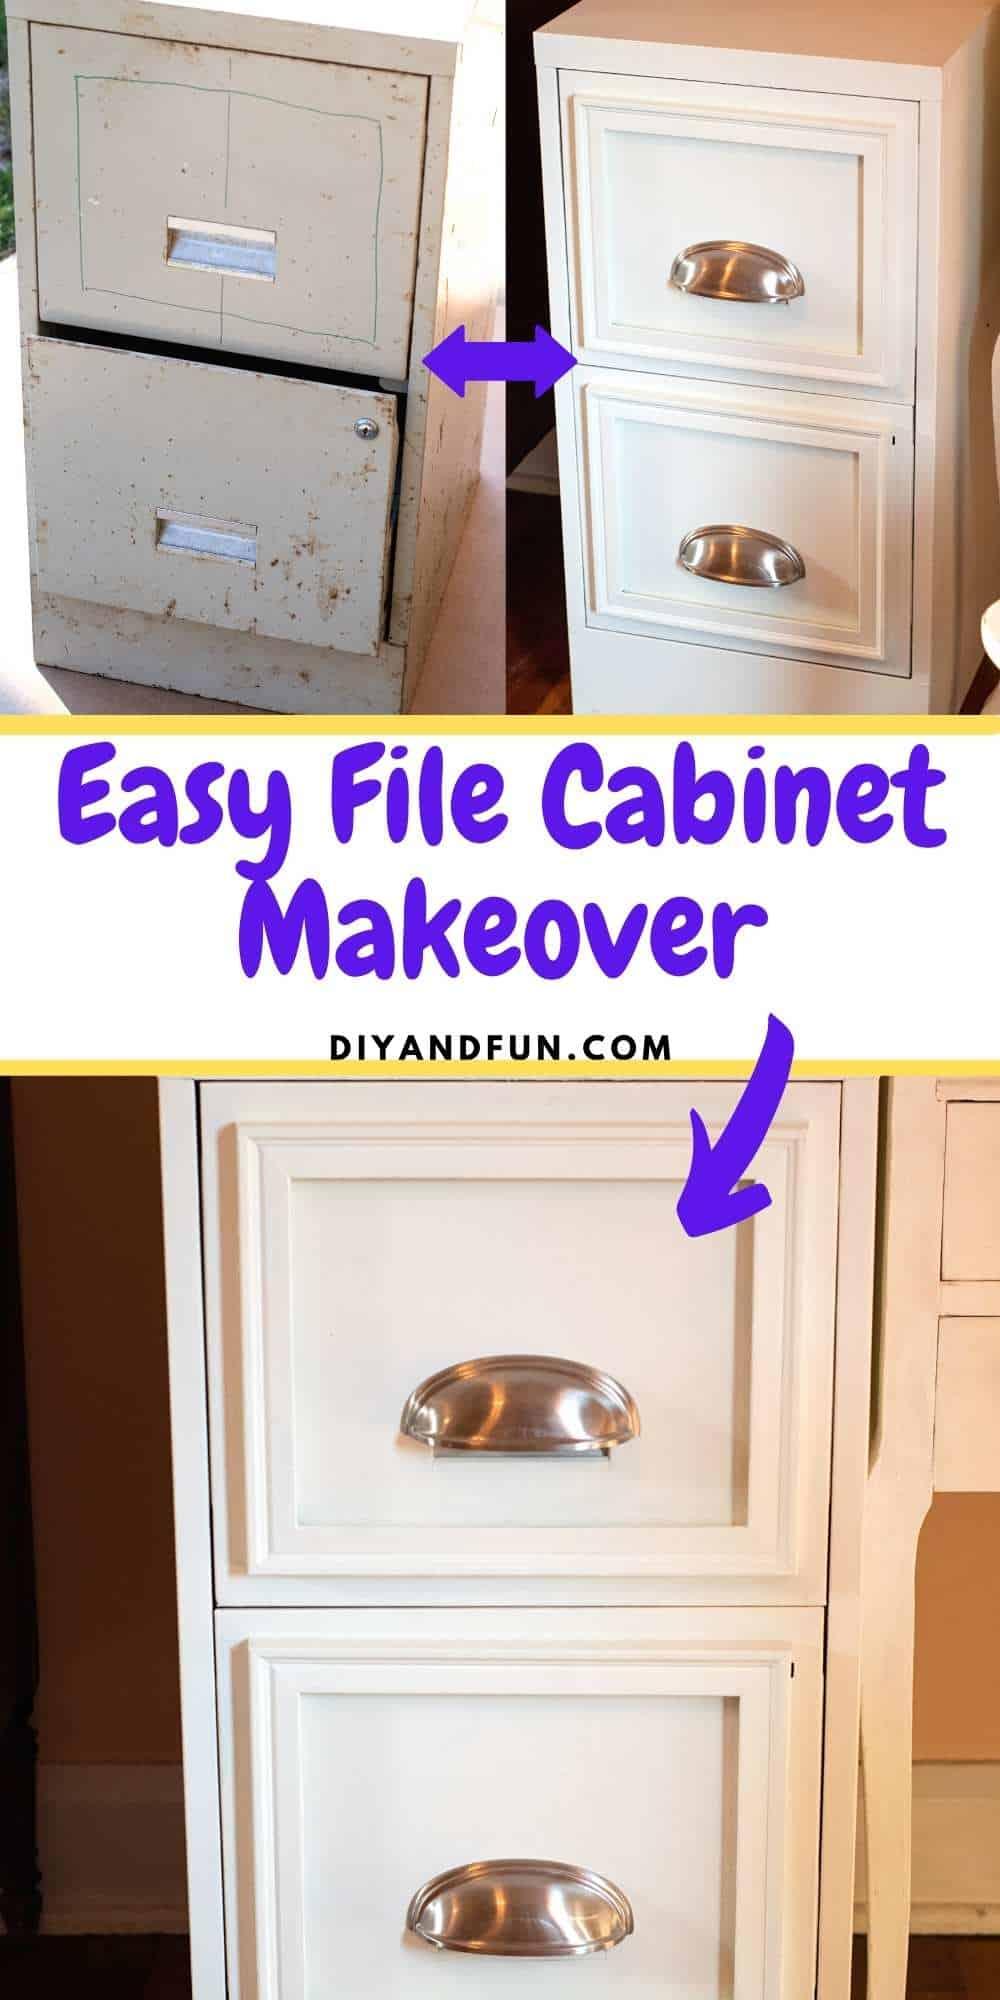 Easy File Cabinet Makeover